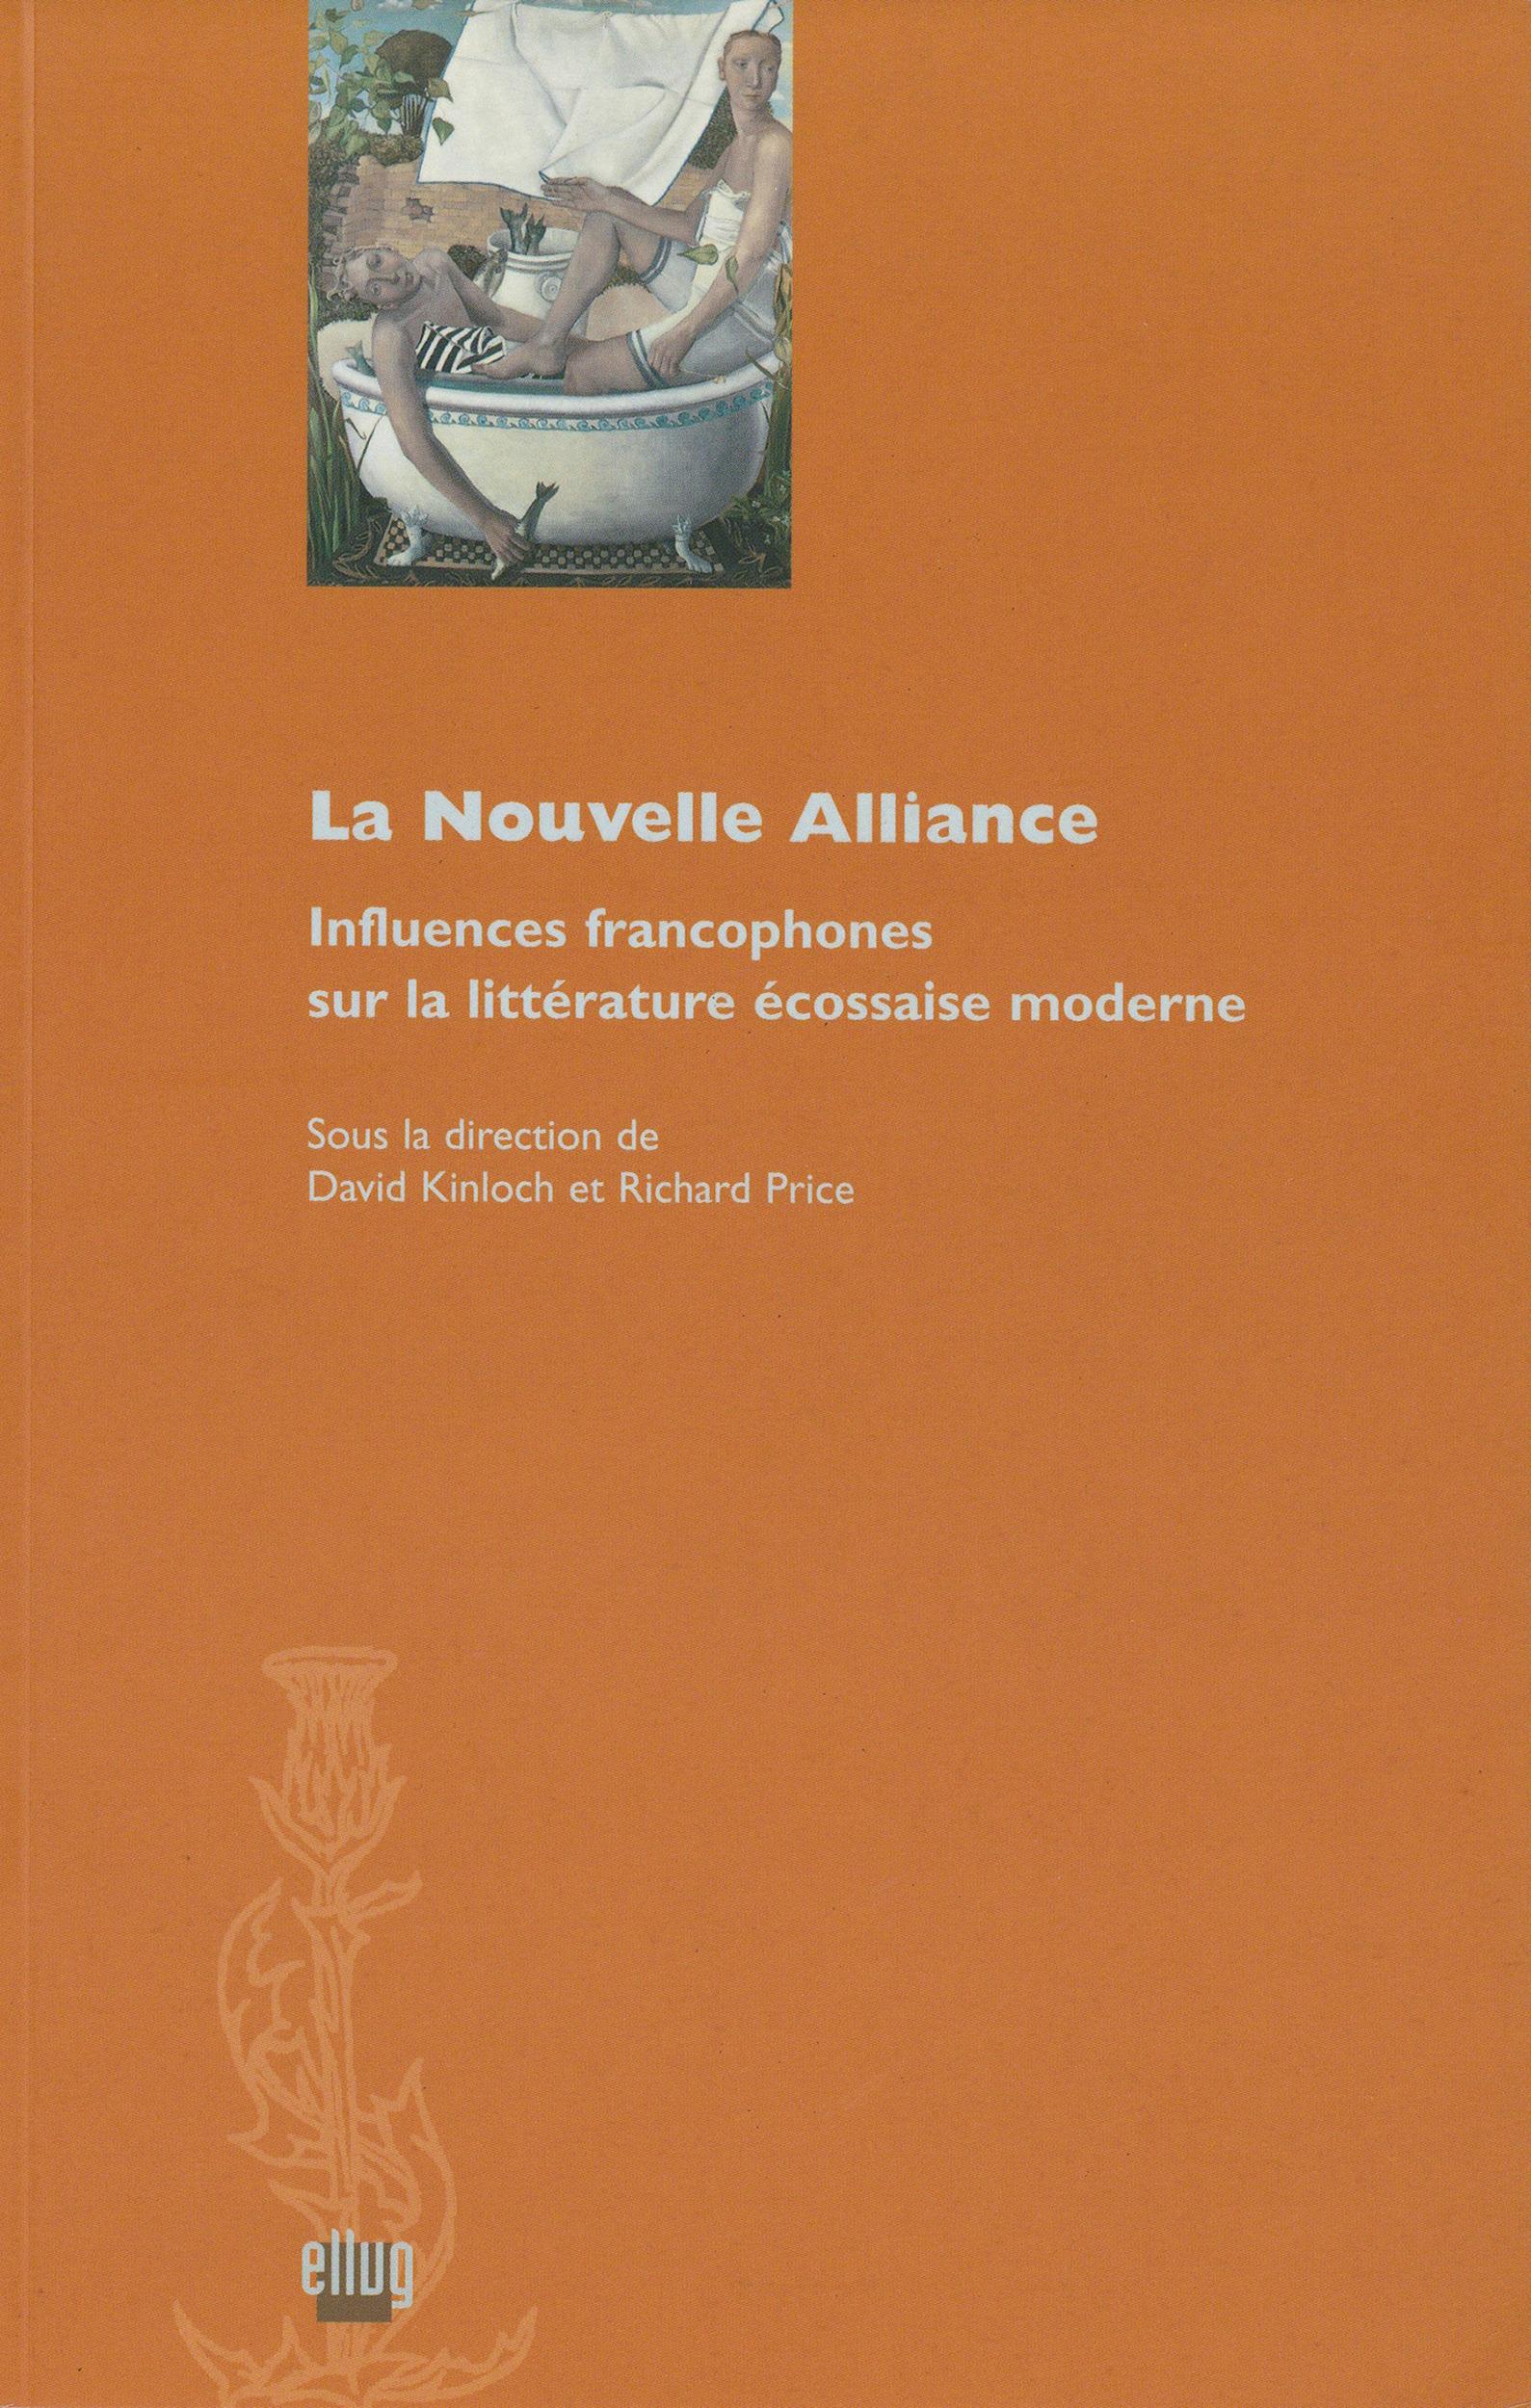 La Nouvelle Alliance  - Collectif  - Richard Price  - David Kinloch